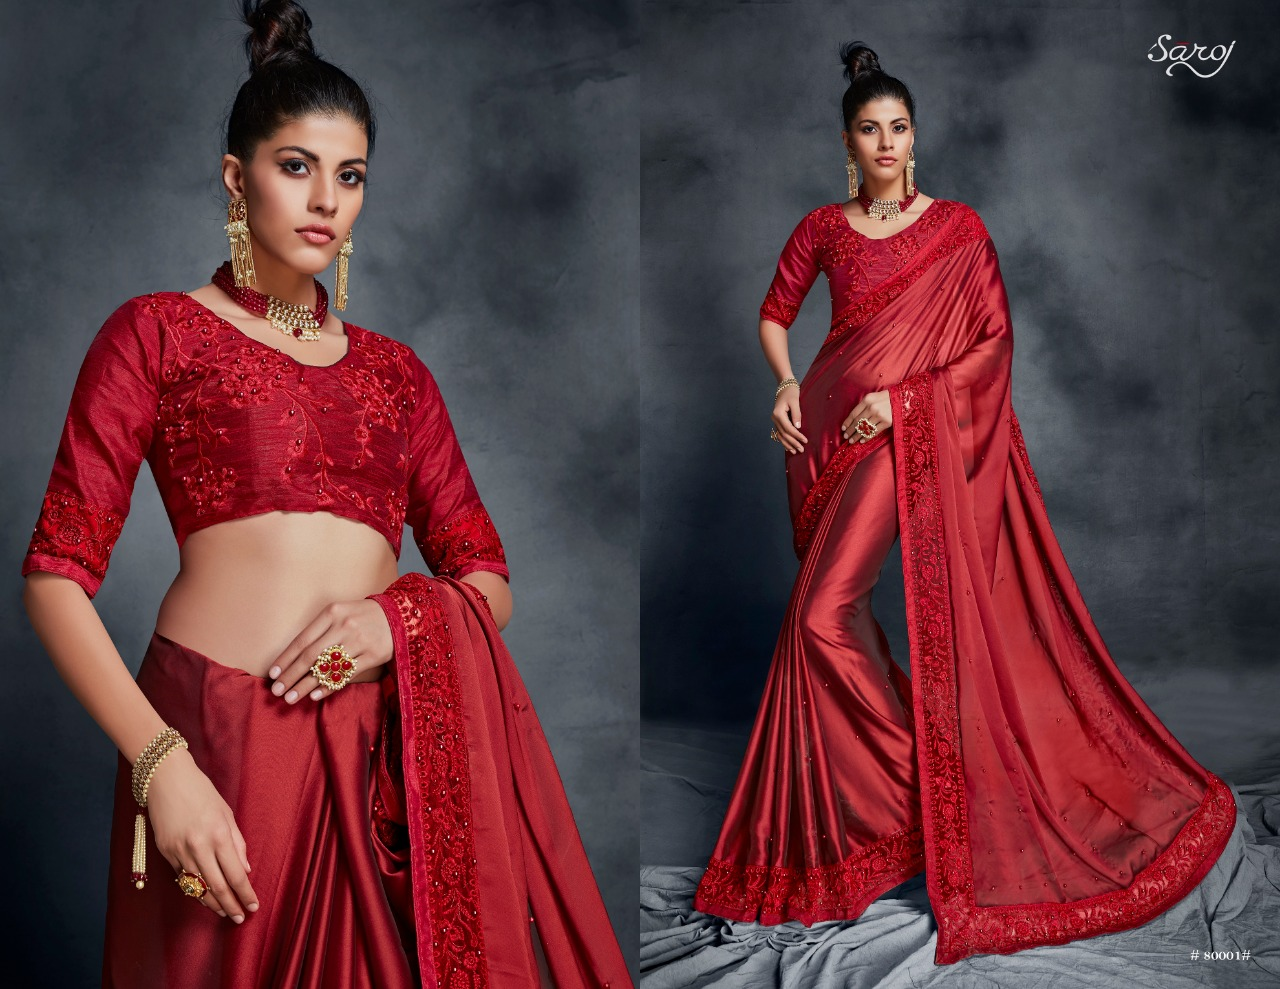 Look - Akshara stylish saree collection video